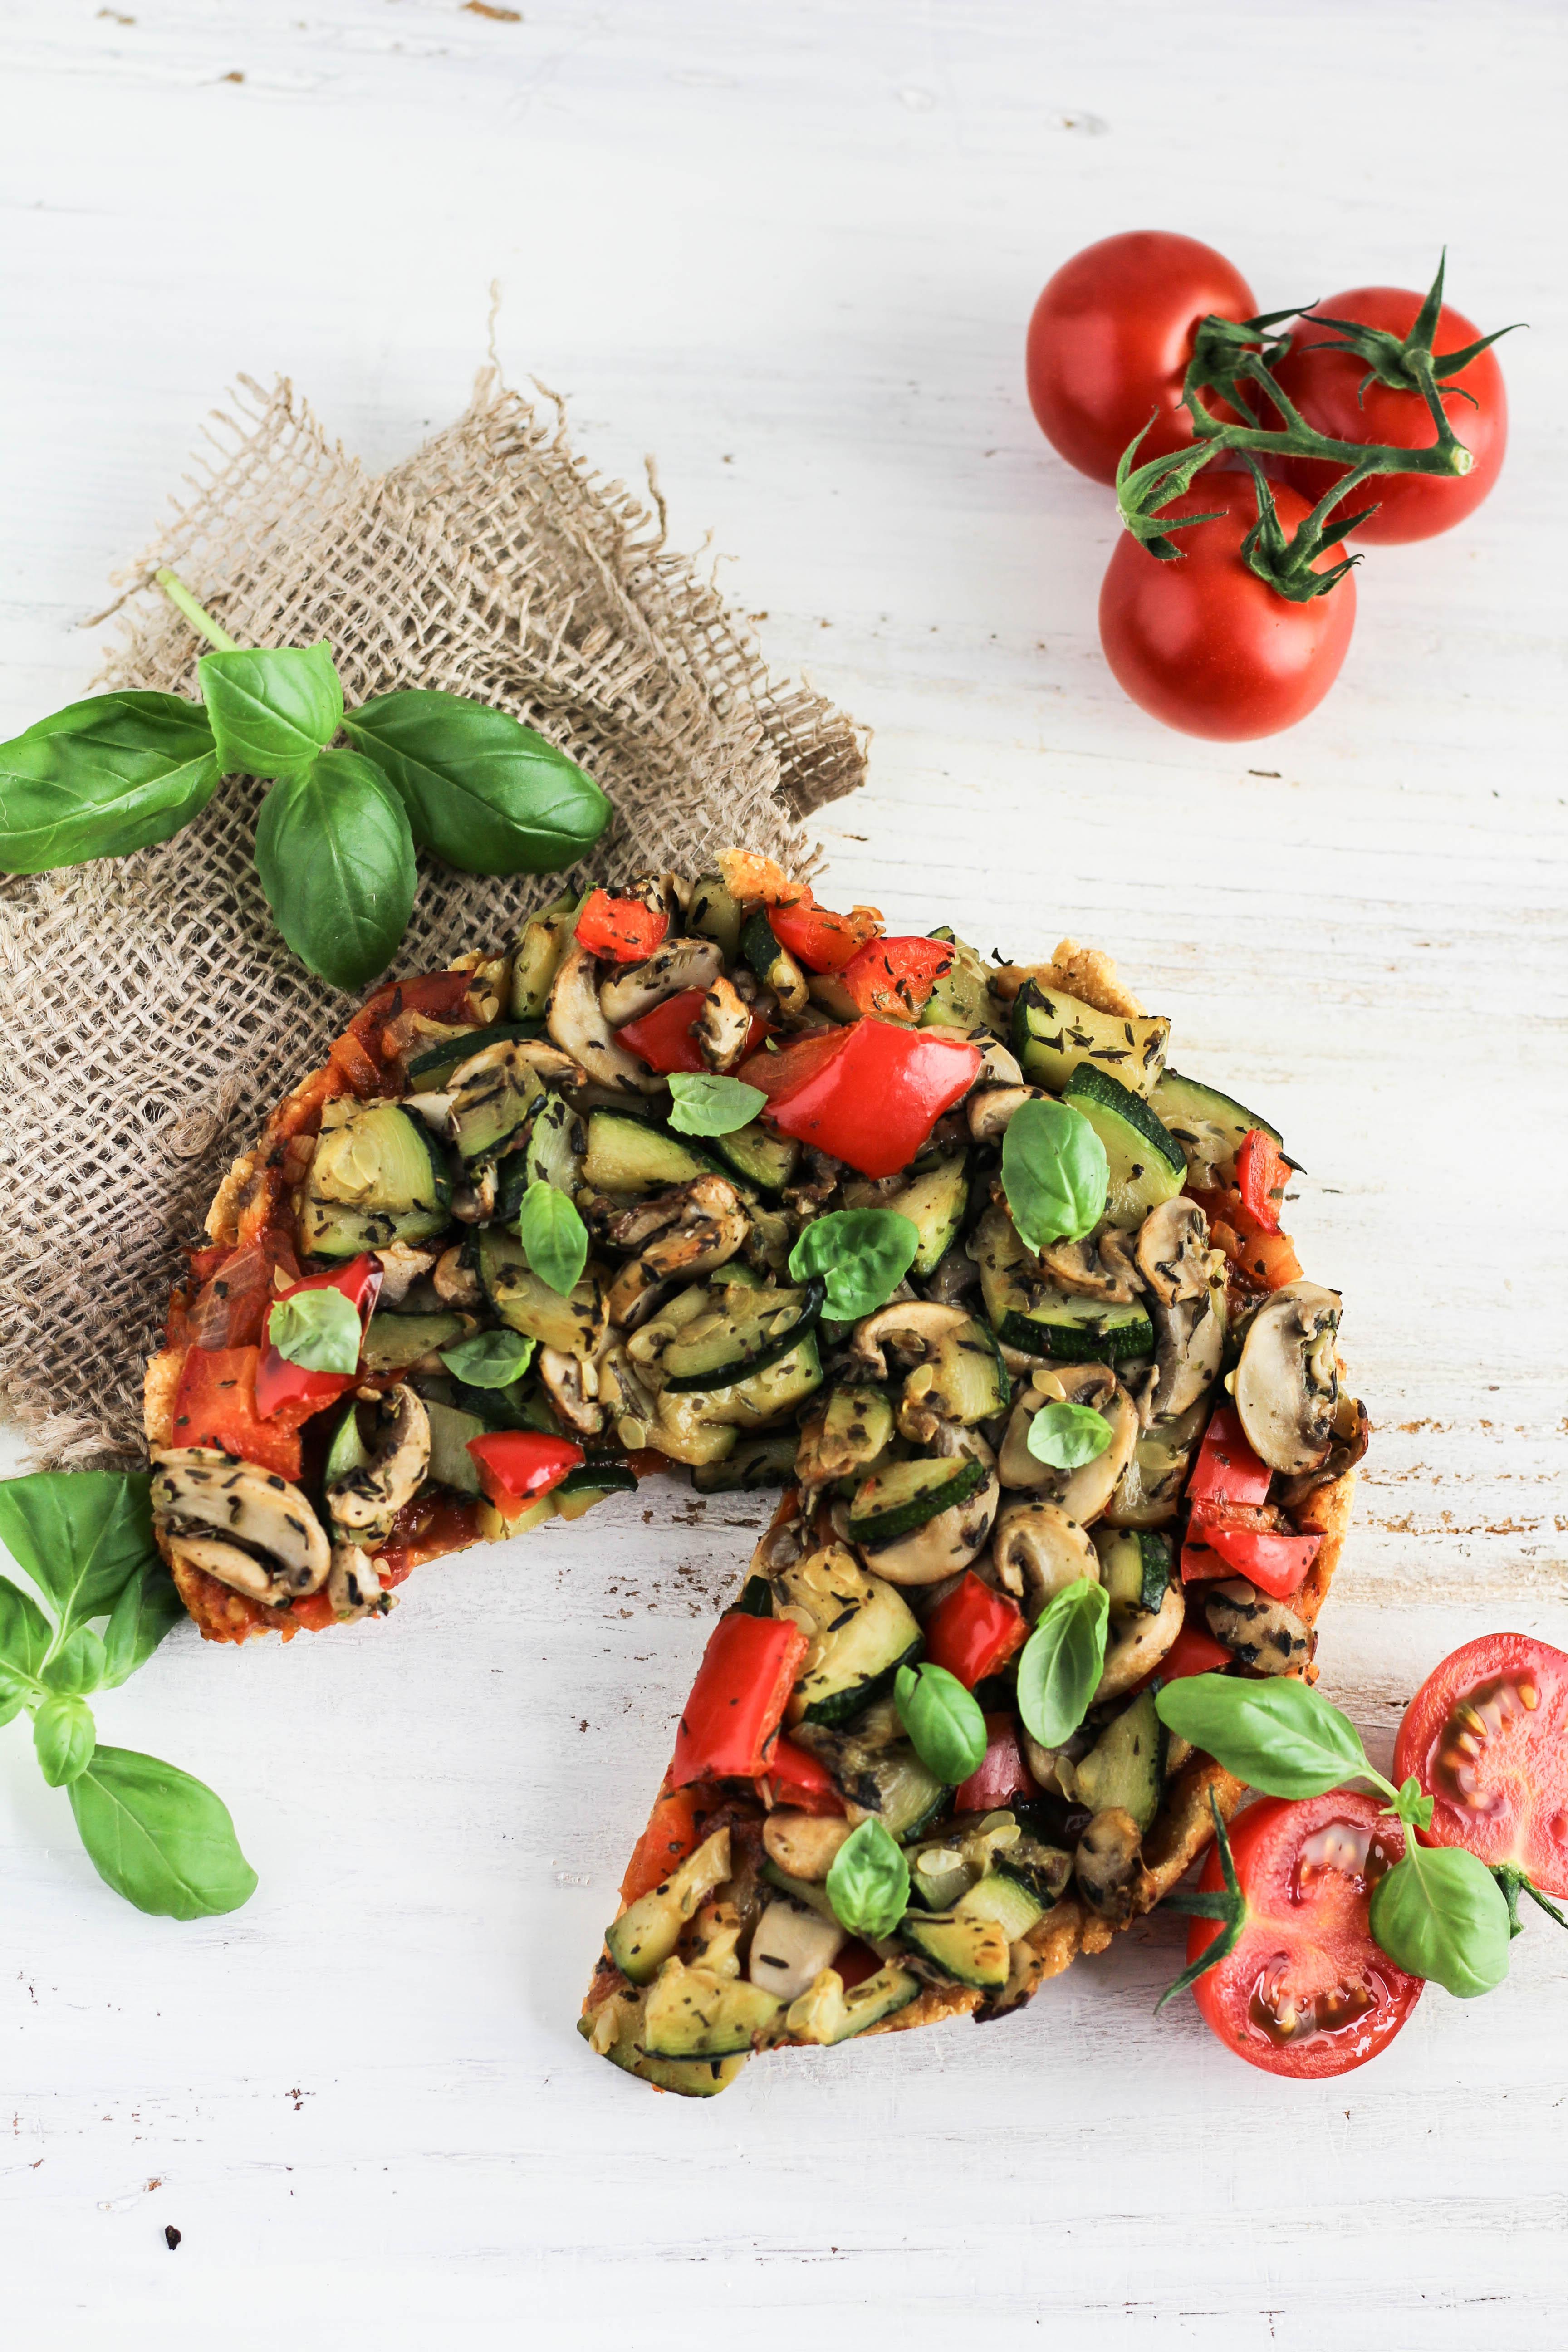 super-leckere-vegane-pizza-aus-kichererbsenmehl